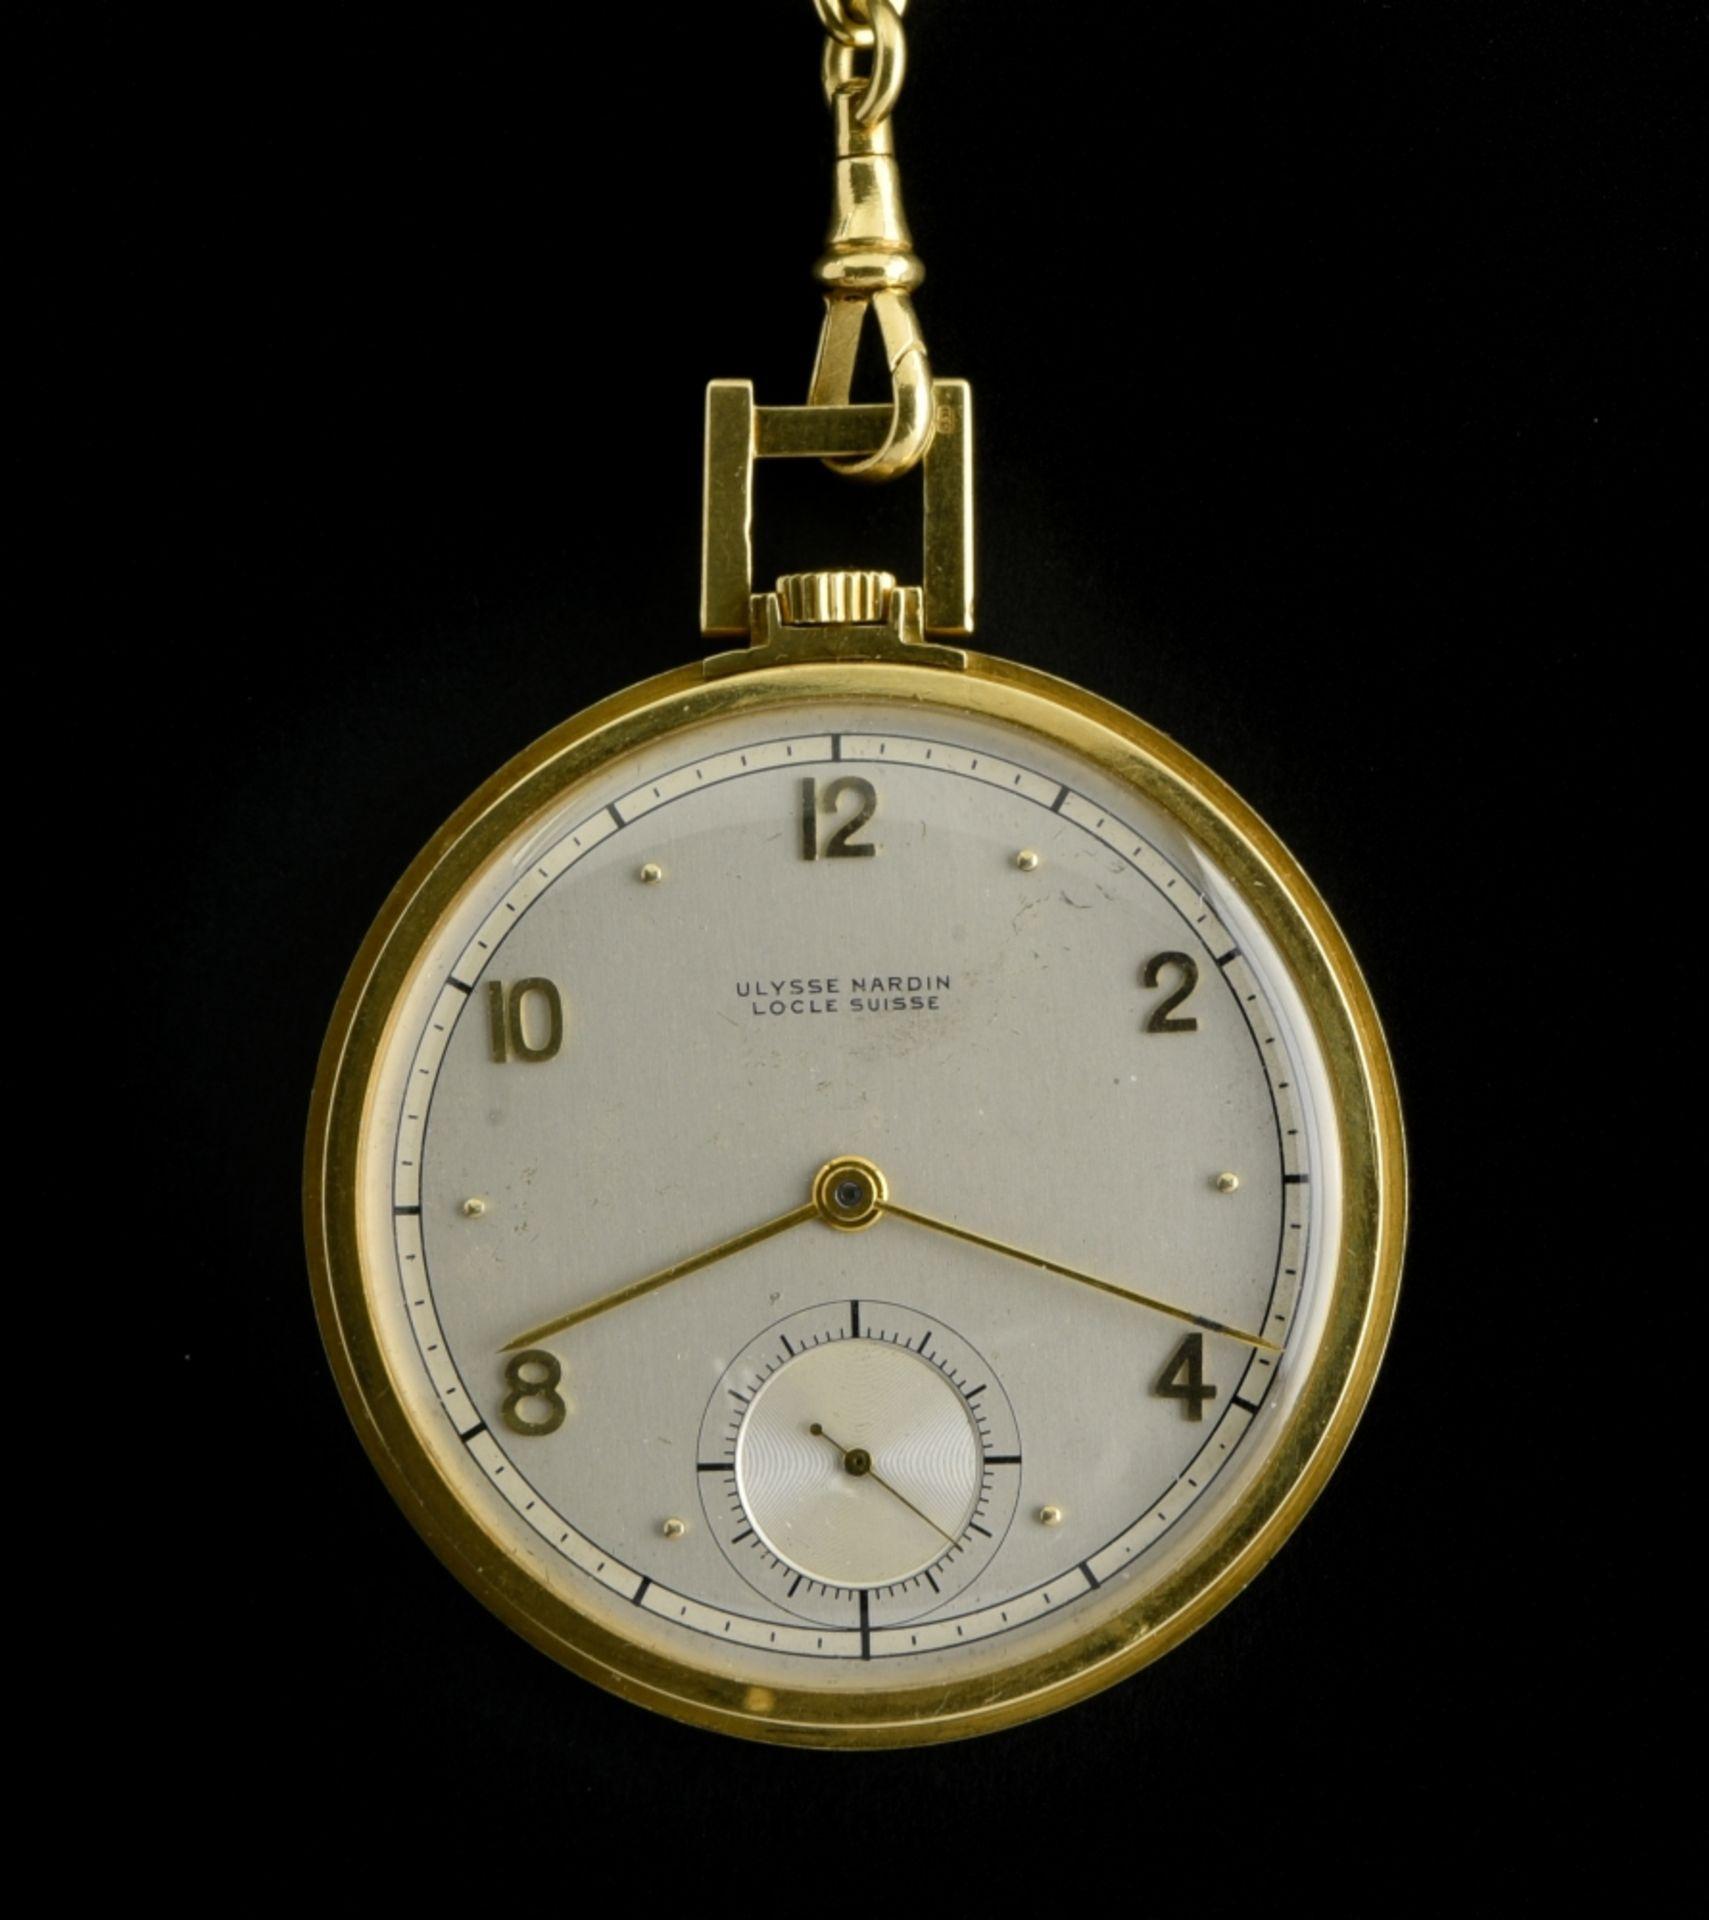 Ulysse Nardin Ulysse Nardin chronometer watch SWITZERLAND 18k gold Ulysse Nardin pocket watch.